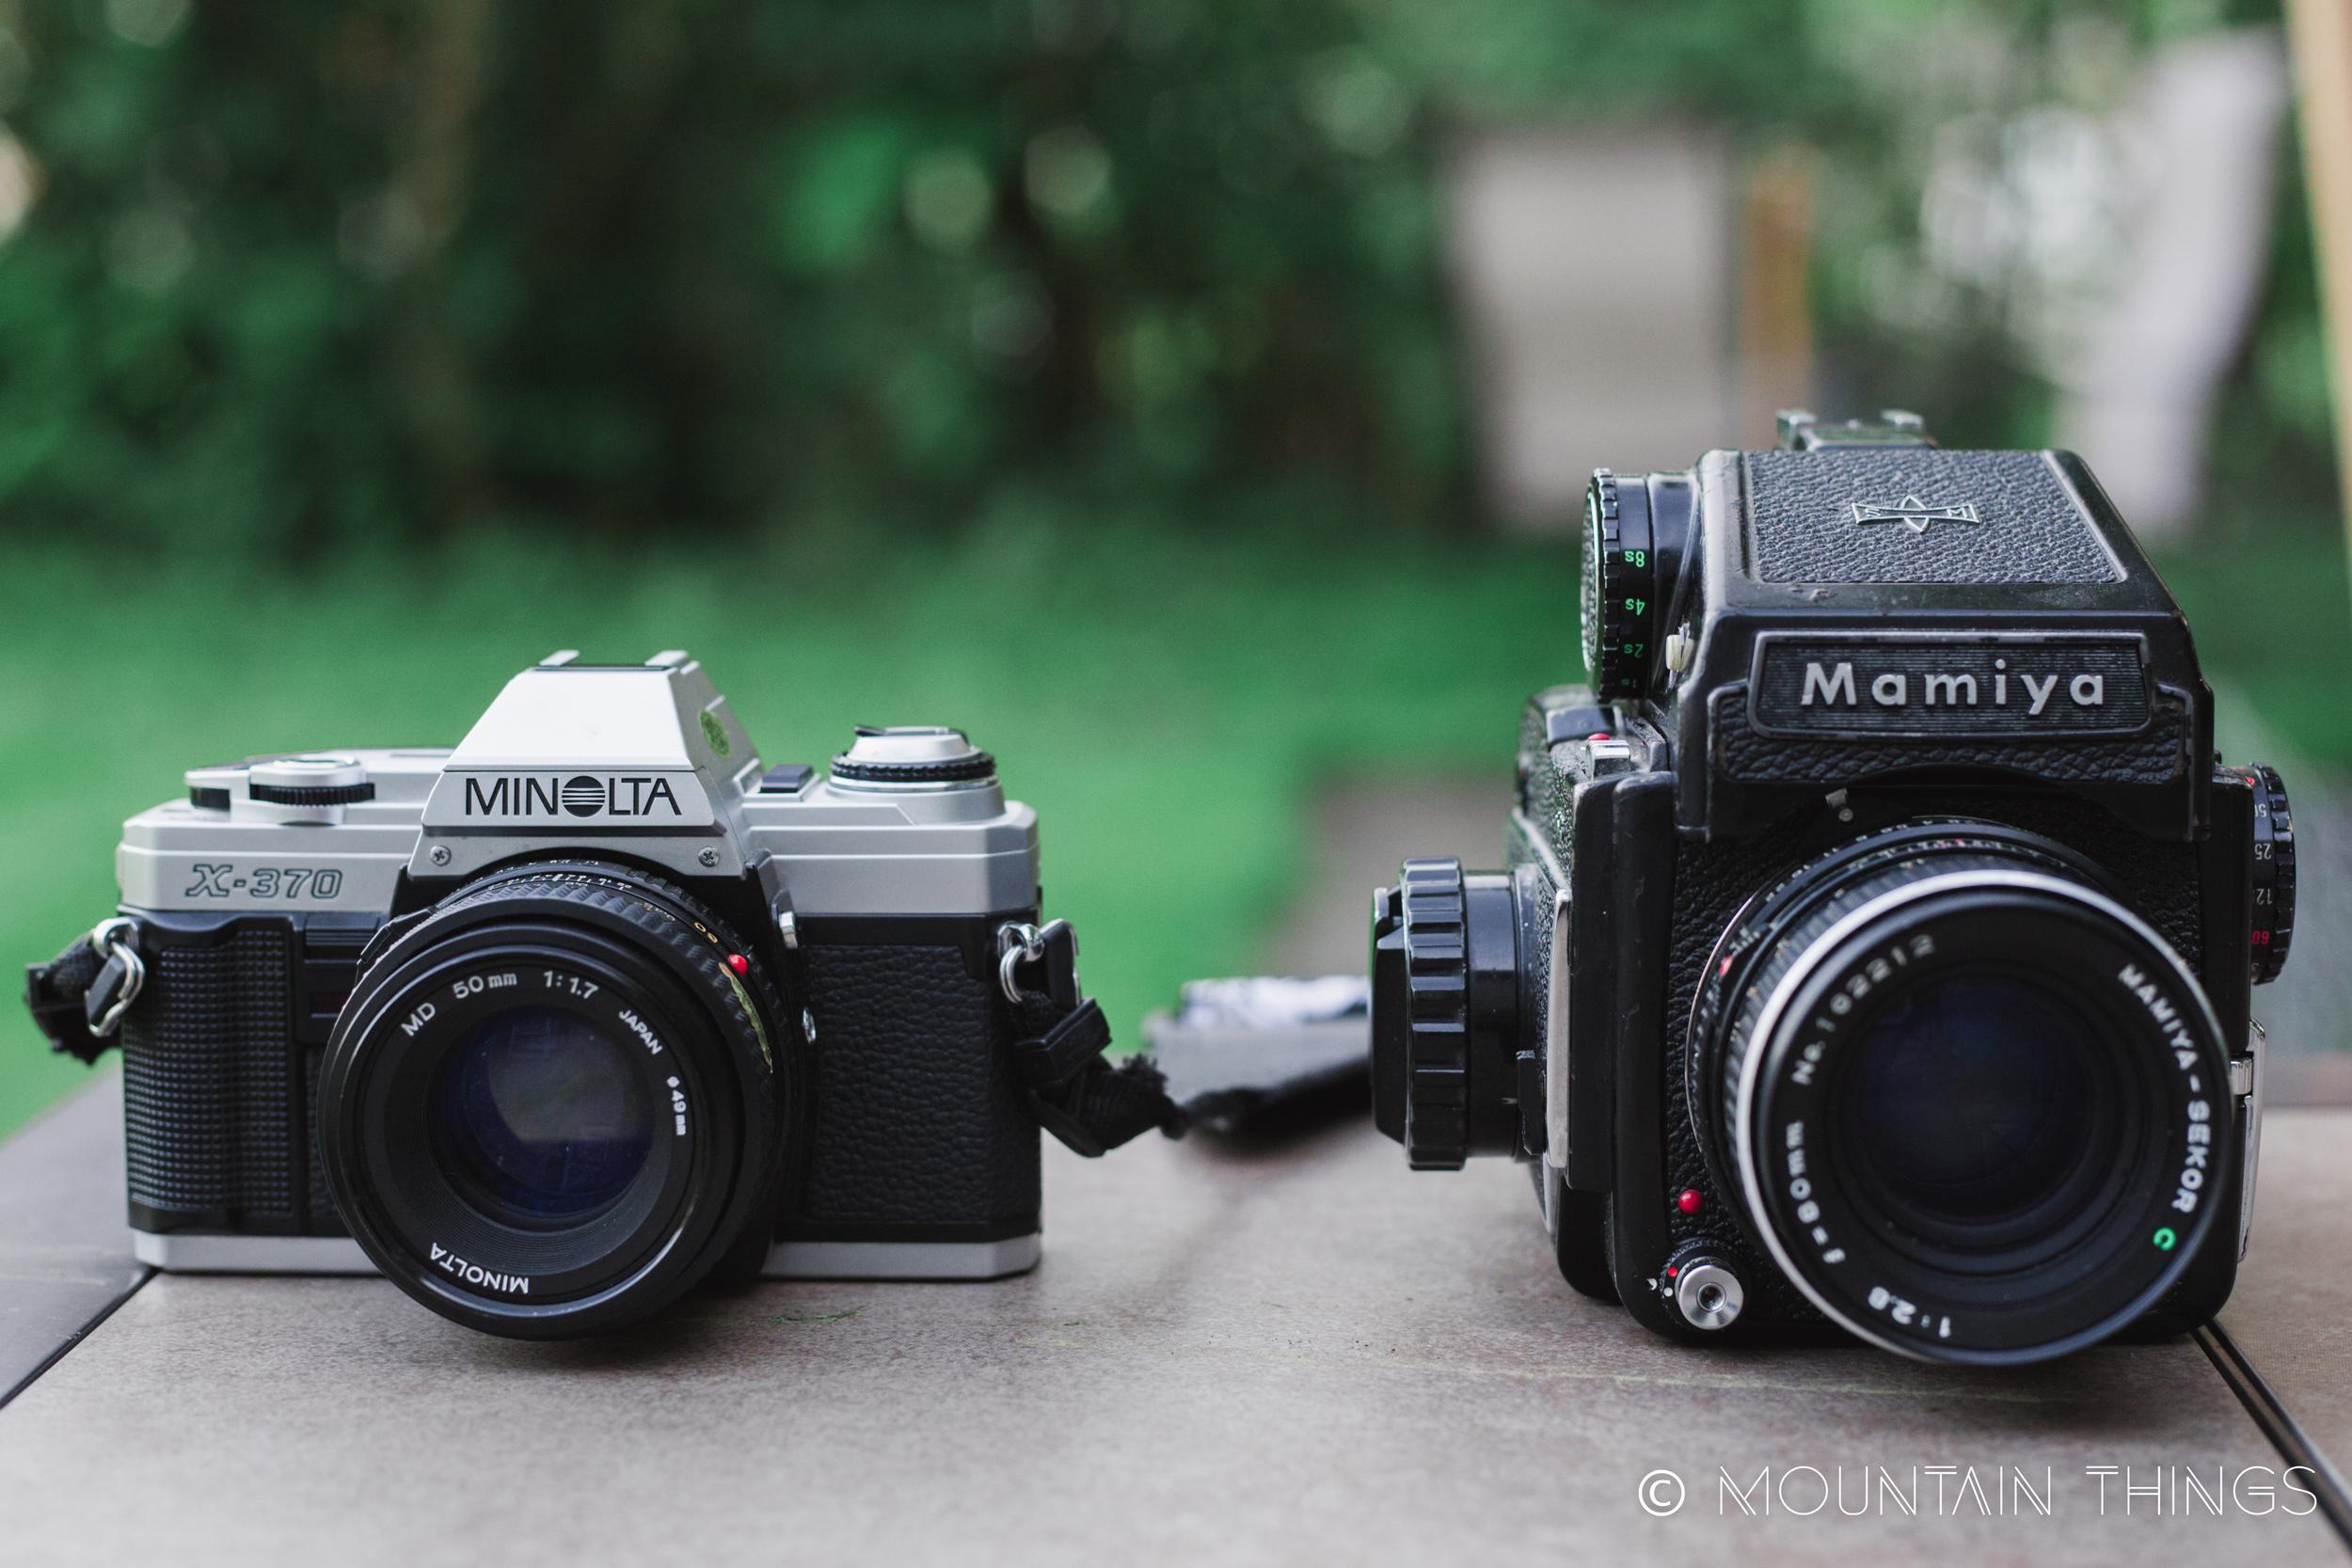 Minolta x-370 and mamiya m645 medium format comparison